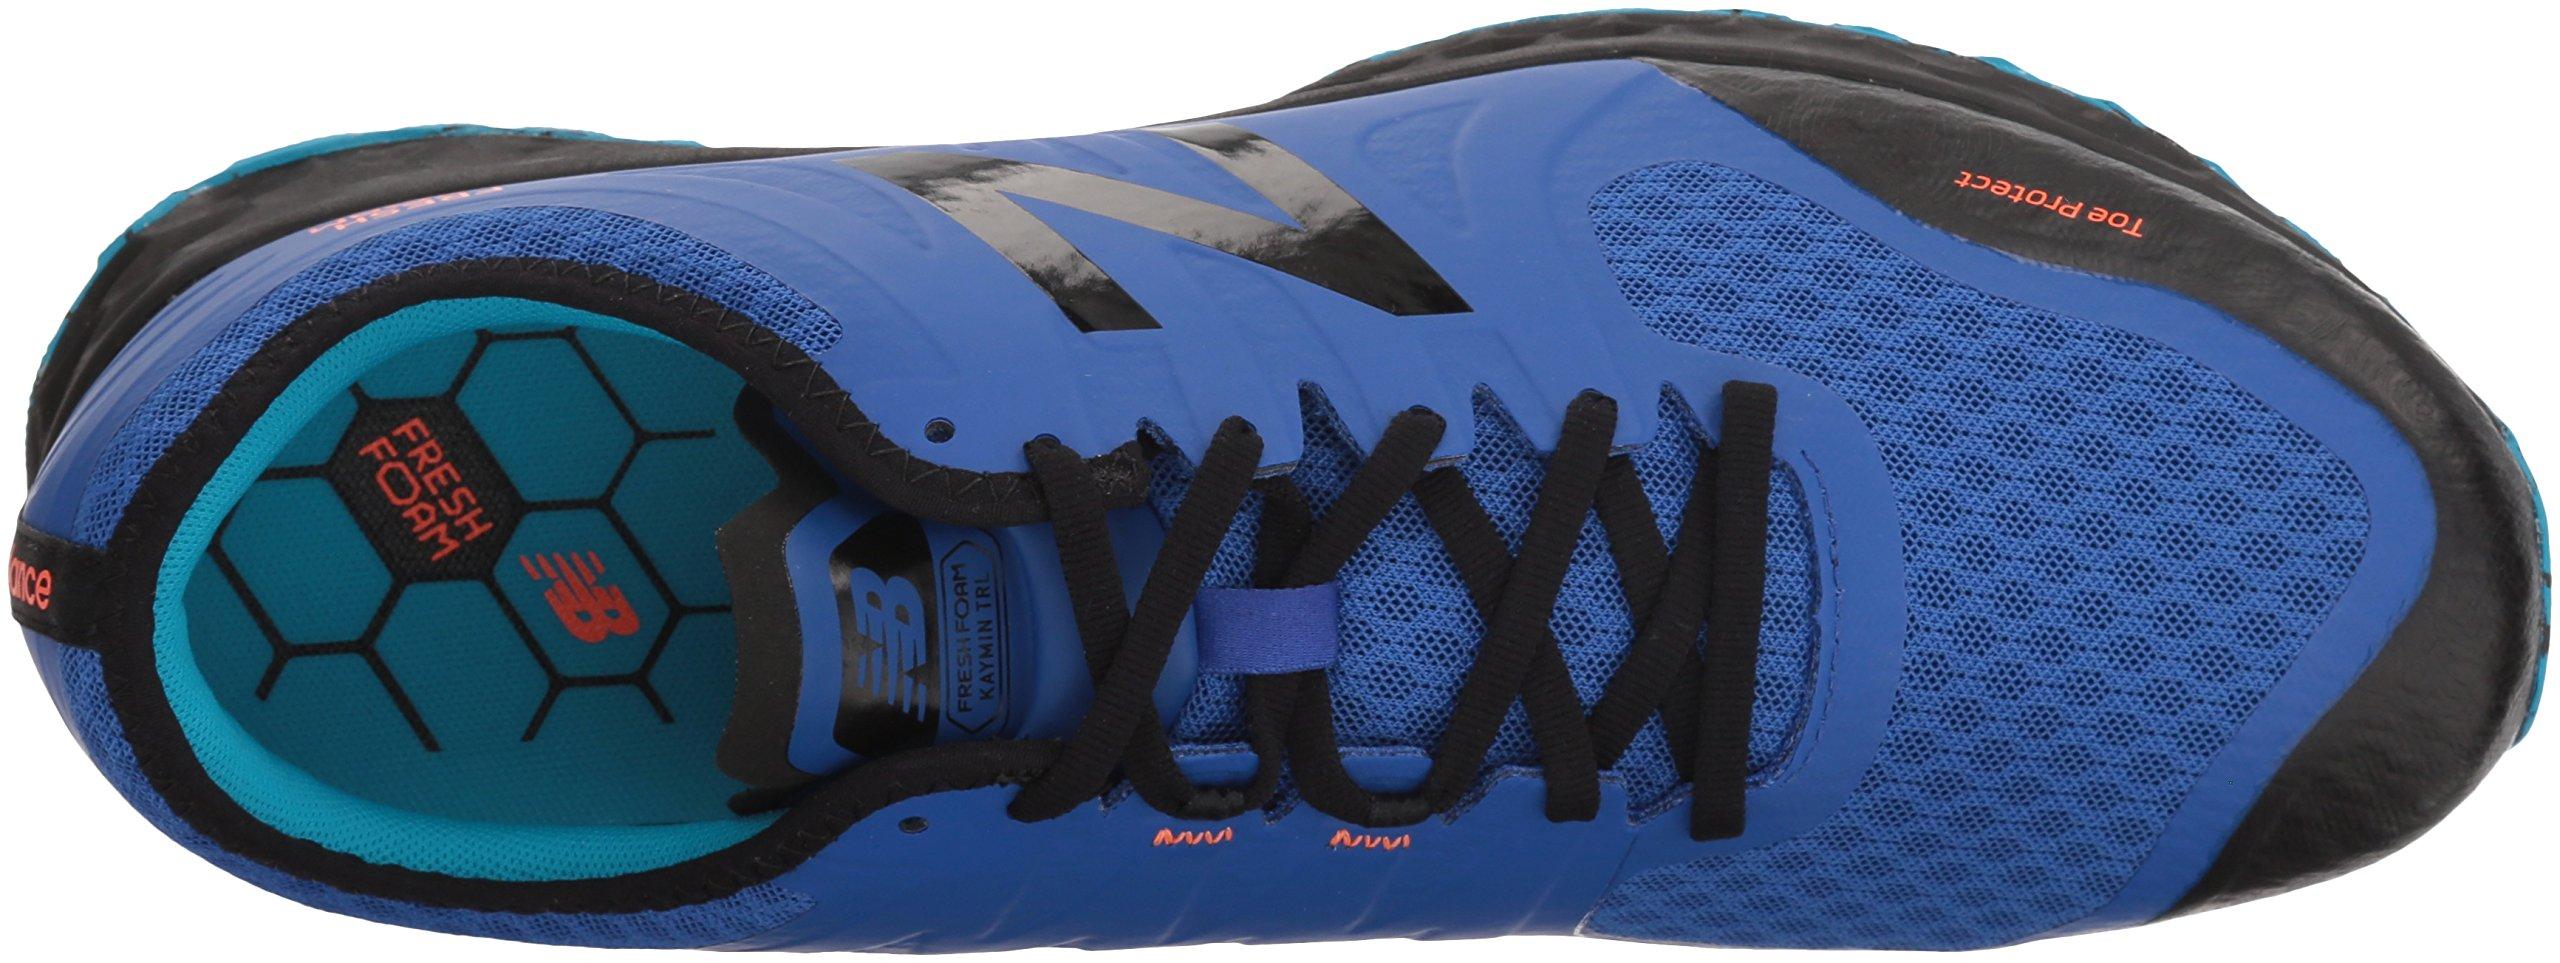 New Balance Men's Kaymin Trail v1 Fresh Foam Trail Running Shoe, Deep Pacific, 7 D US by New Balance (Image #7)